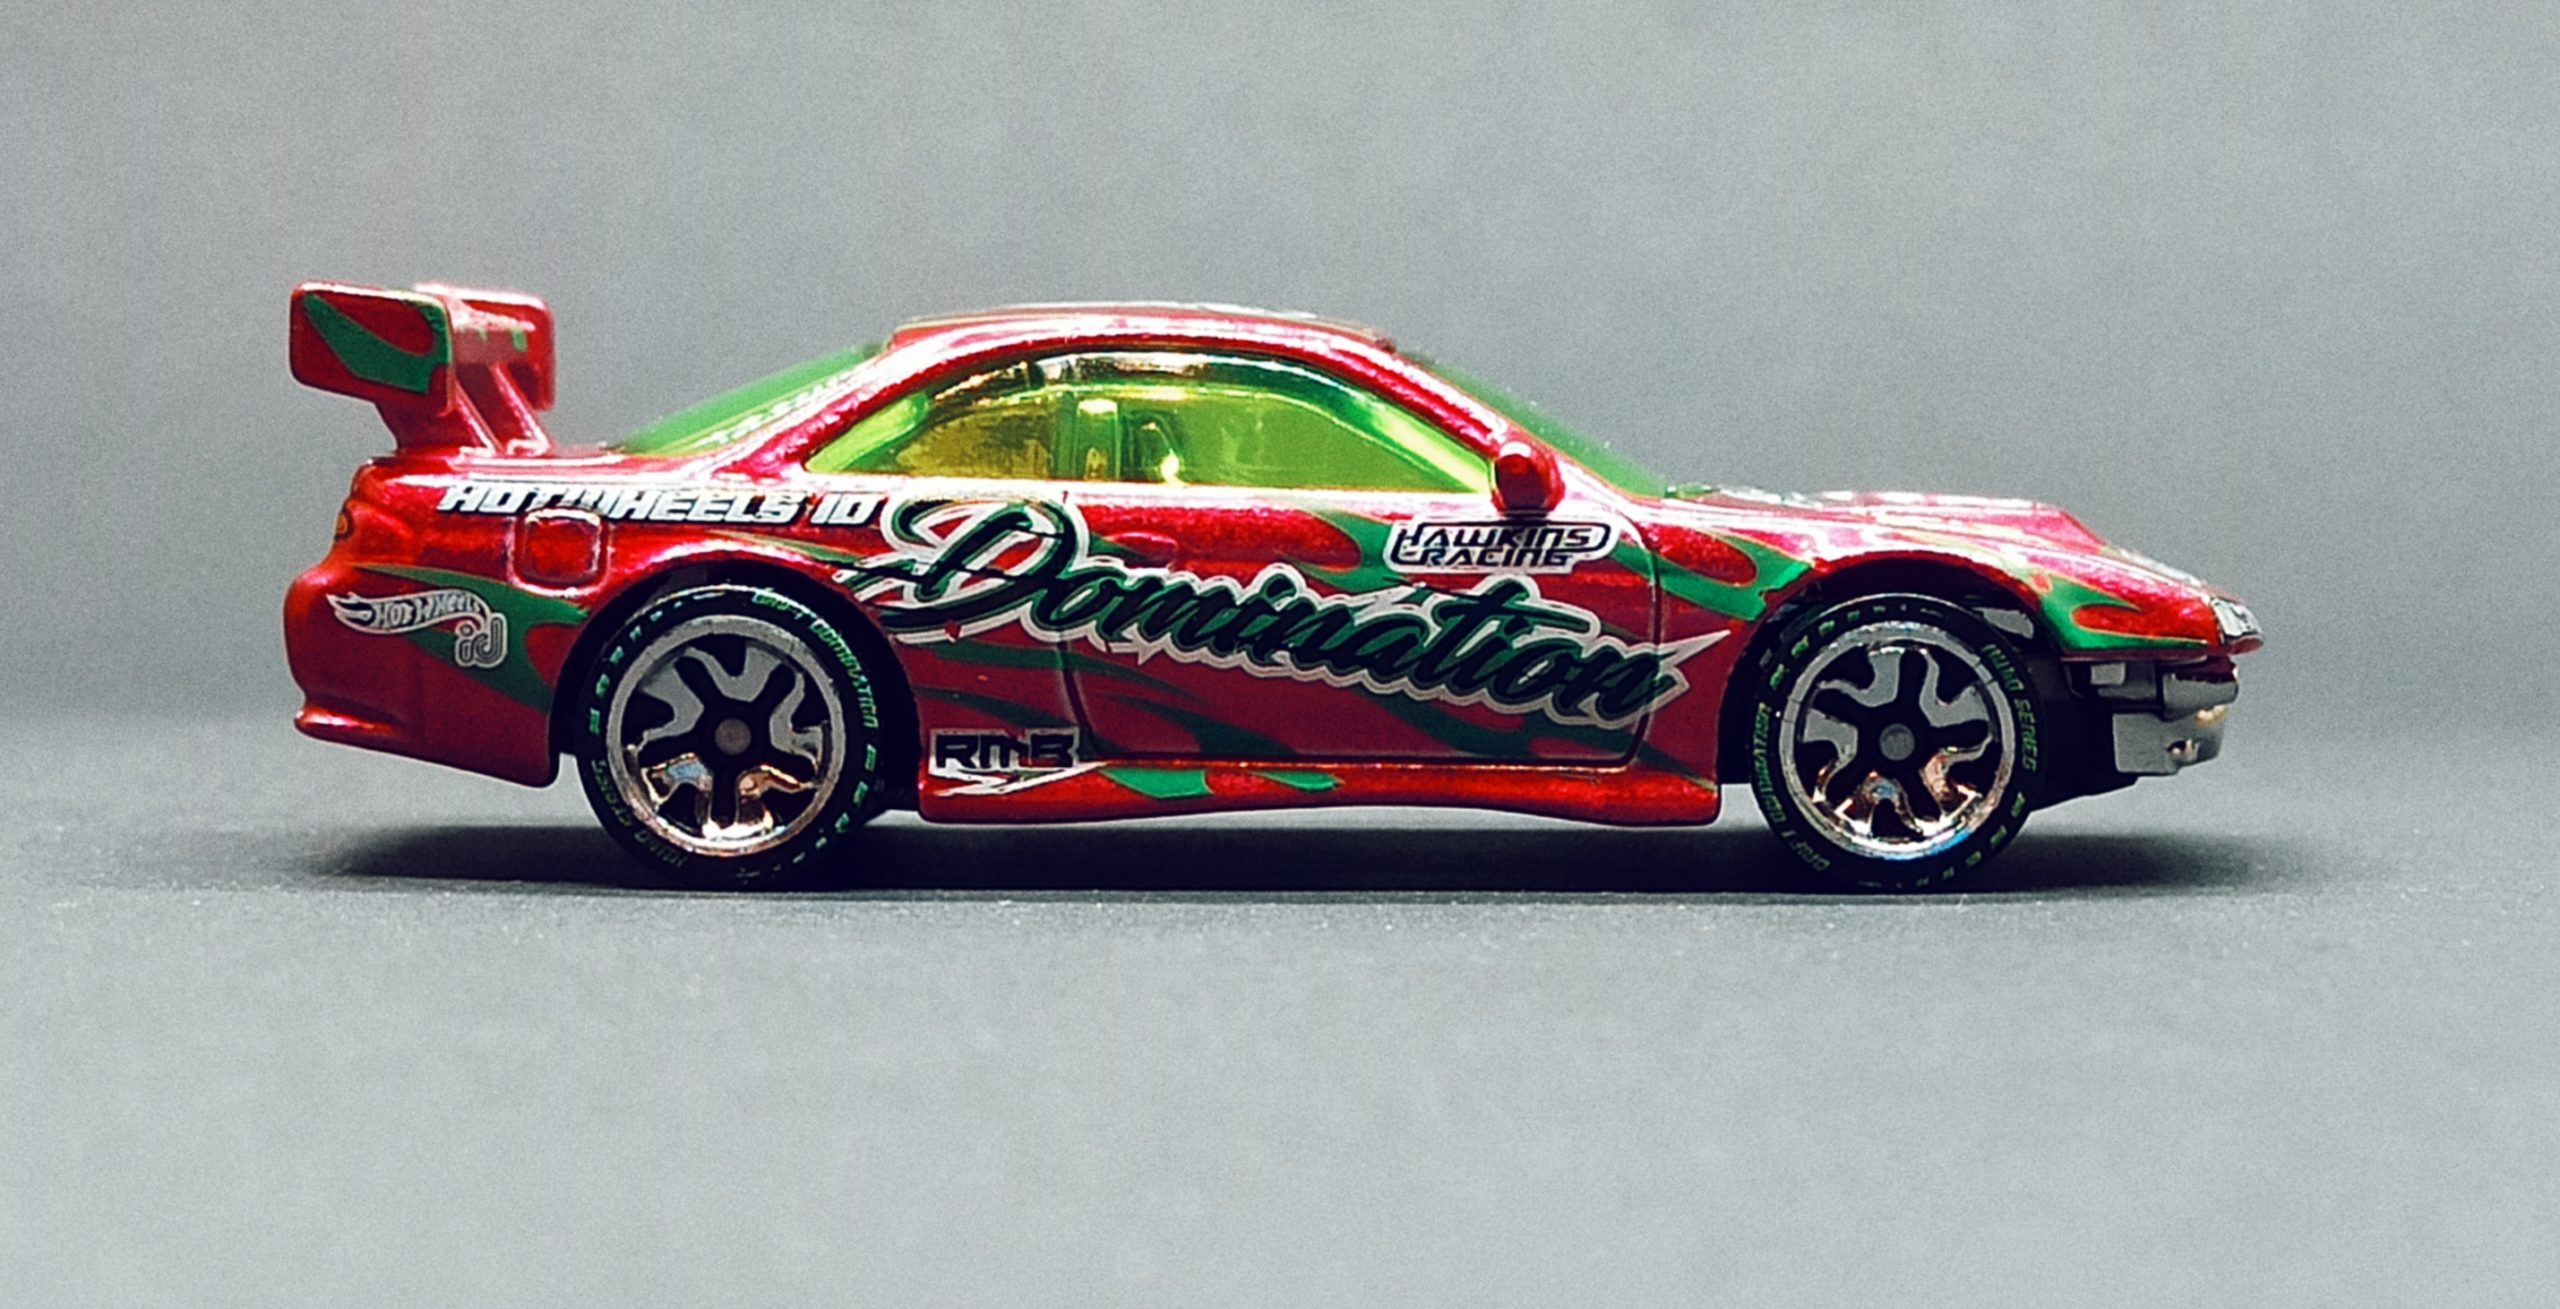 Hot Wheels id Nissan Silvia (S14) Drift (HBG13) 2021 Drift Domination (03/04) spectraflame pink side